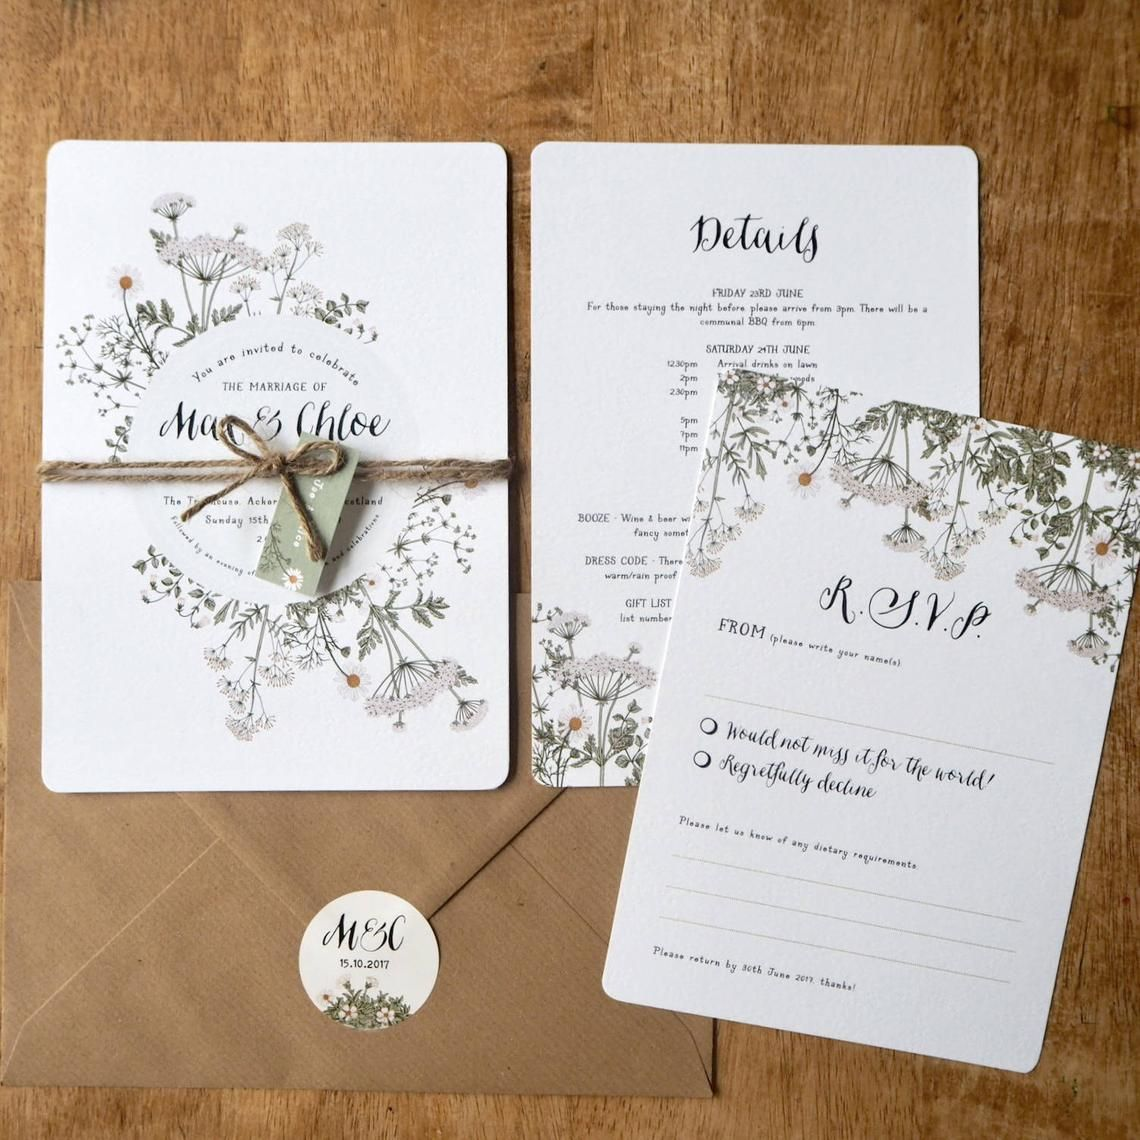 Summer Meadow Wedding Invitation And Matching Stationery Etsy Wildflower Wedding Invitations Wedding Invitations Botanical Wedding Stationery